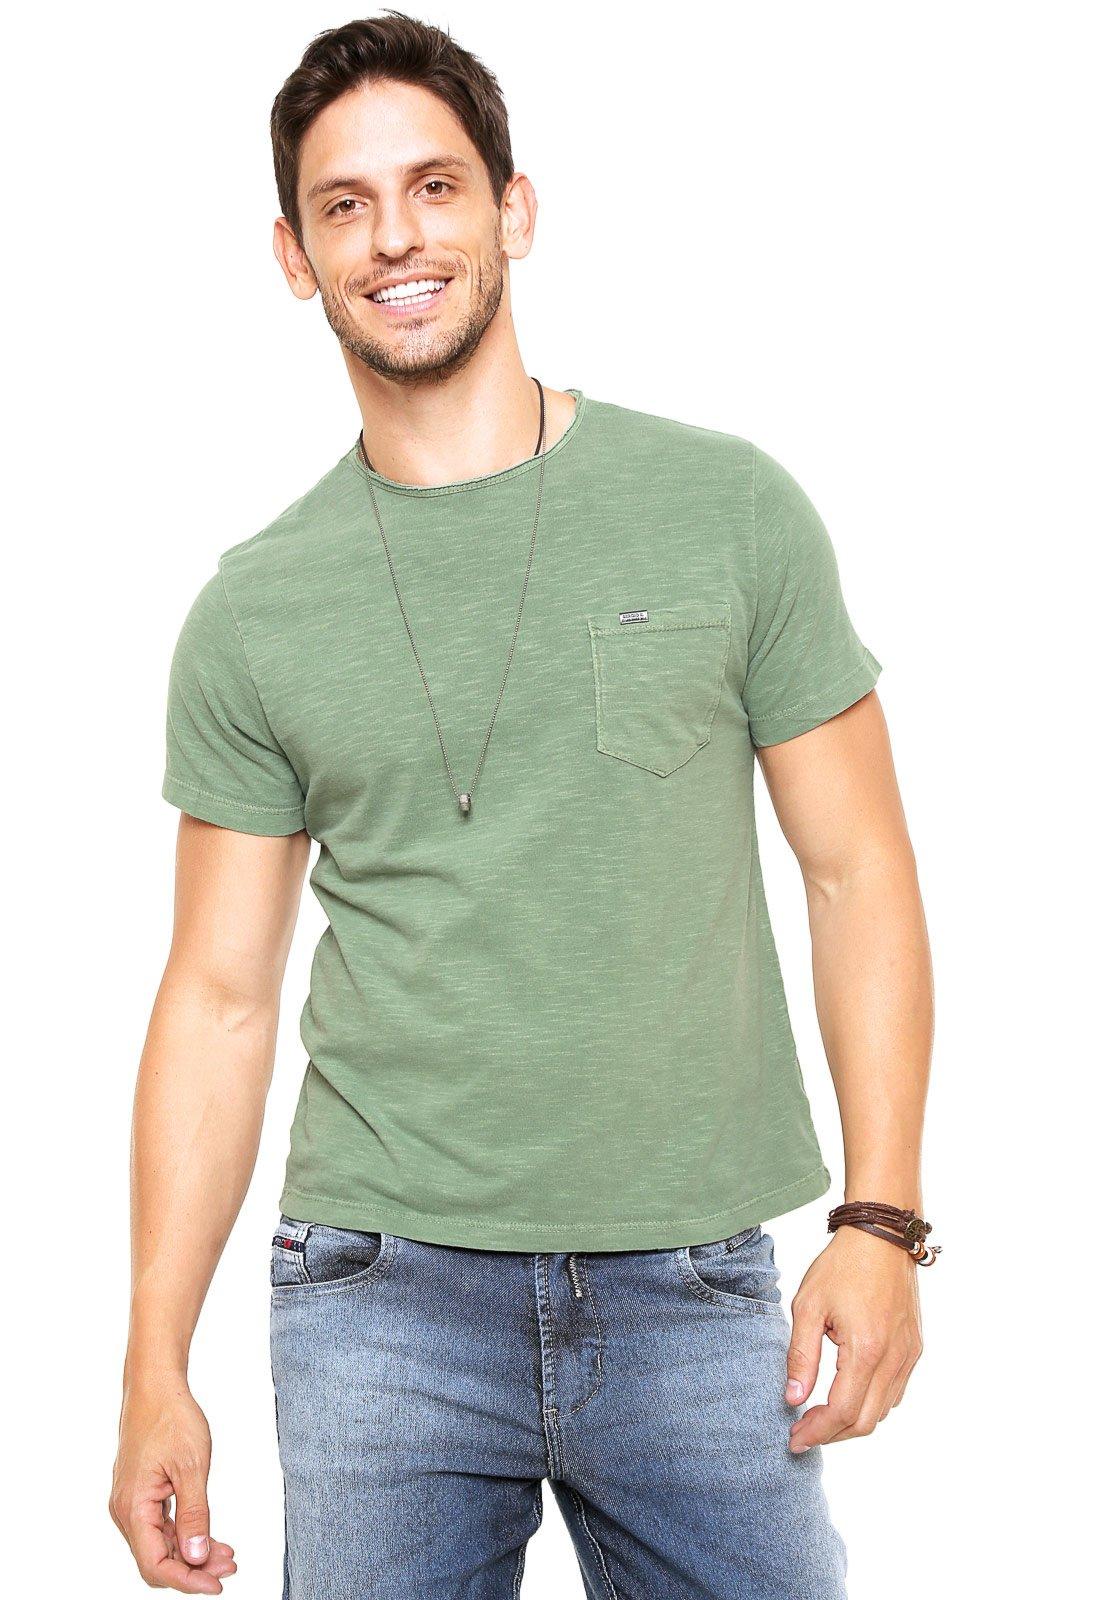 2ccc81552e Camiseta Sergio K Bolso Verde - Marca Sergio K ...